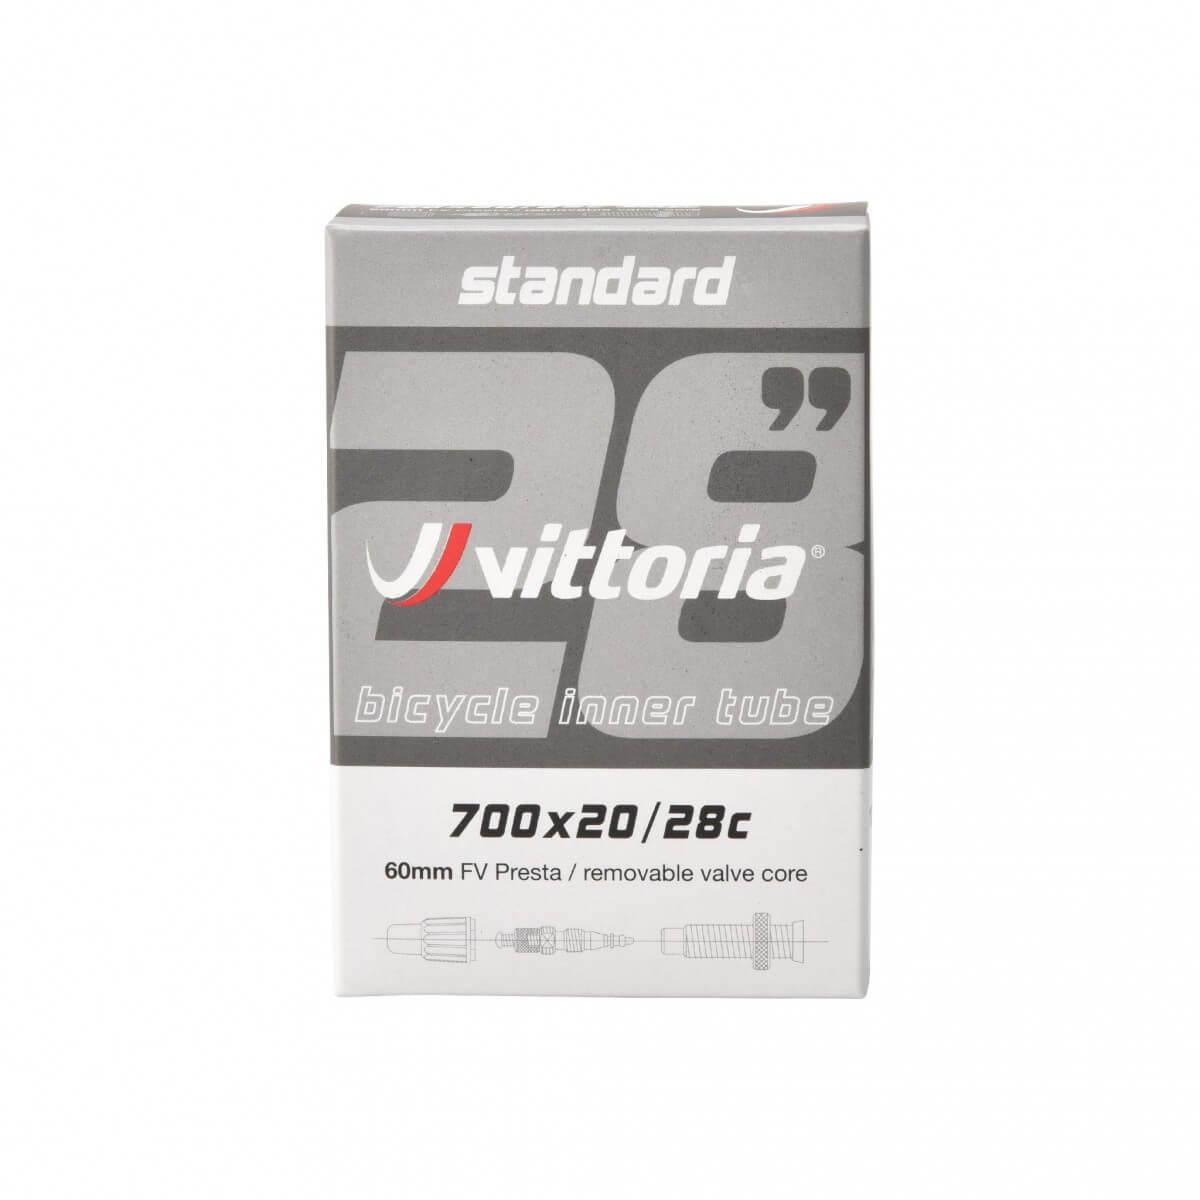 Vittoria STANDARD tube 700x20 / 28c Valve 60 mm